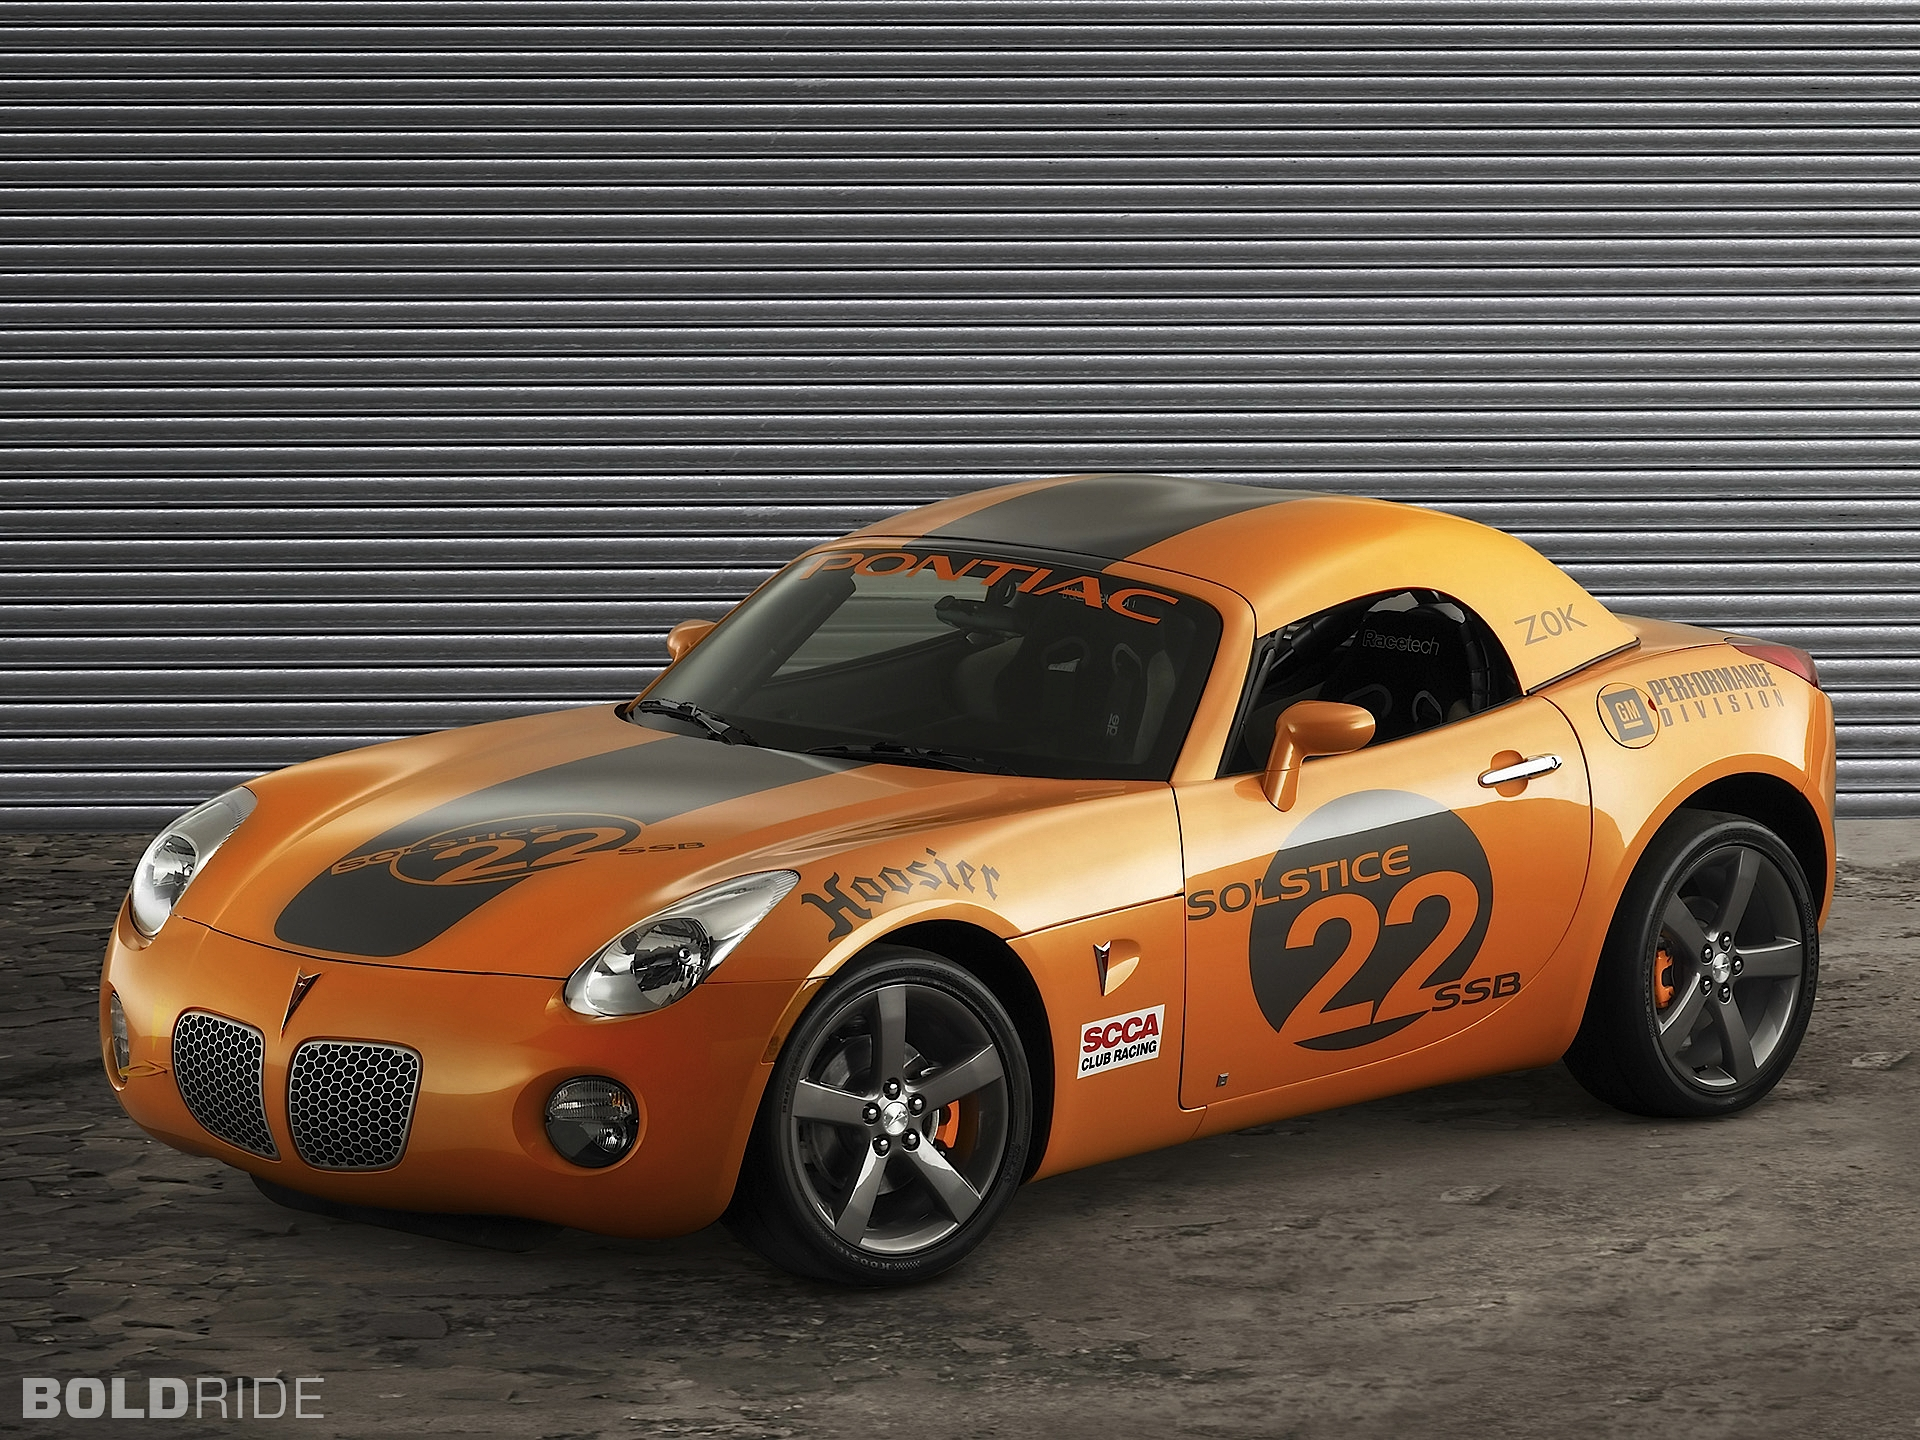 2006 pontiac solstice club sport z0k race cars tuning wallpaper 1920x1440 43962 wallpaperup. Black Bedroom Furniture Sets. Home Design Ideas